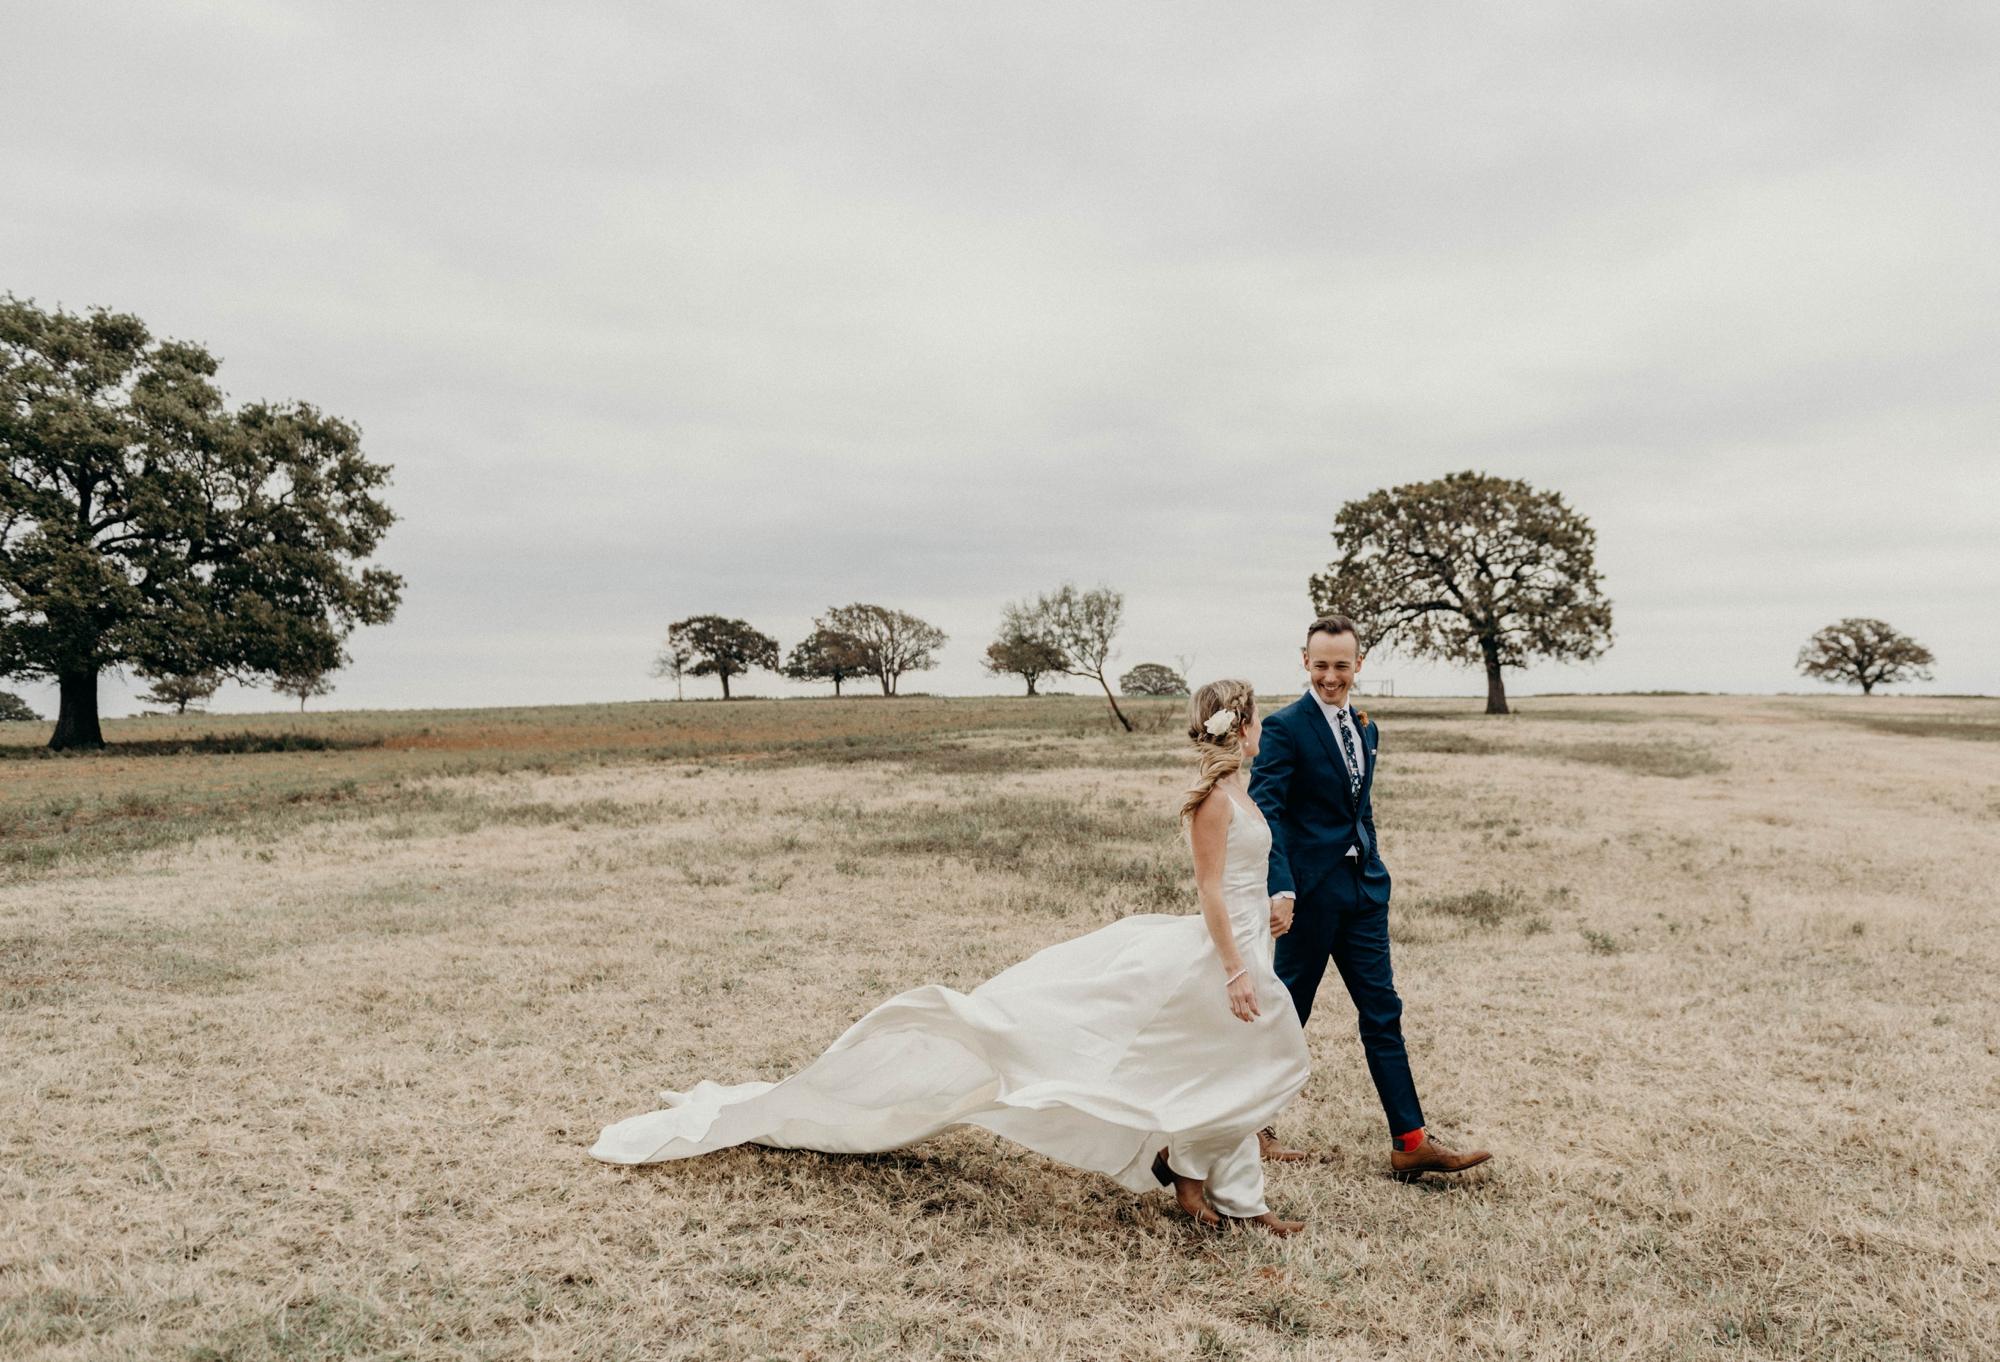 austin-texas-wedding-photography-1778-photographie-25.jpg